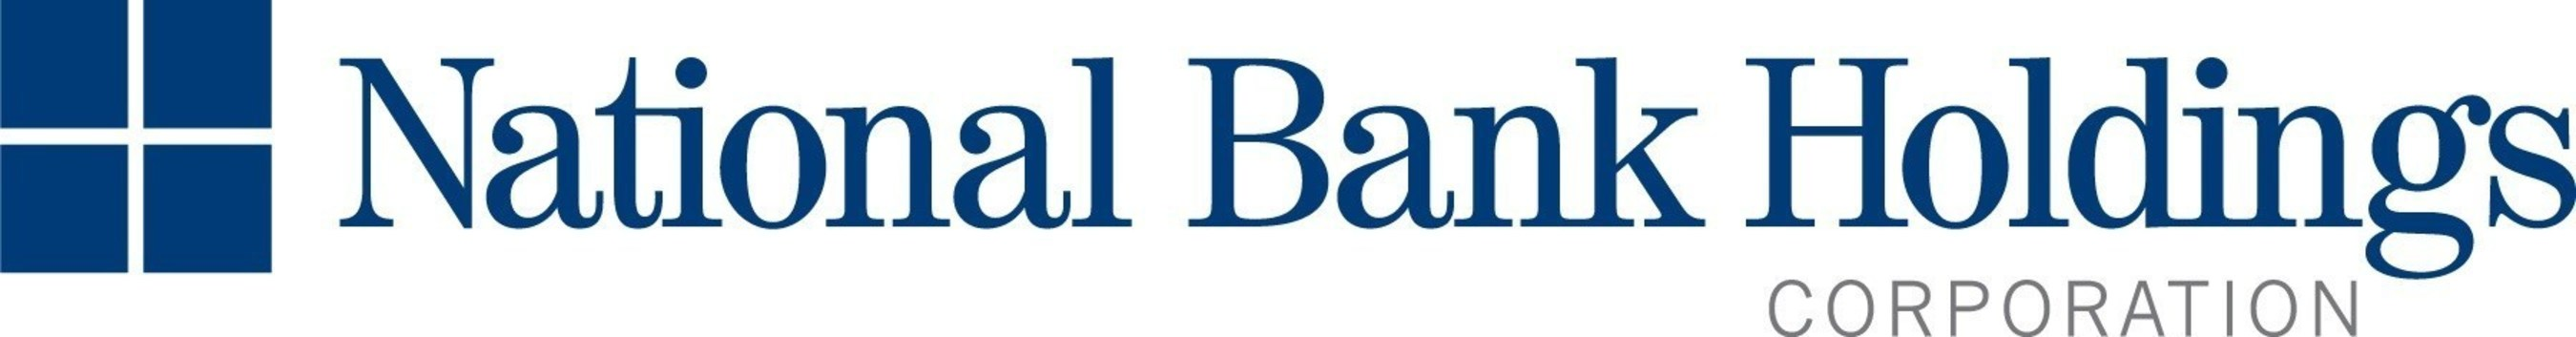 National Bank Holdings Corporation Logo